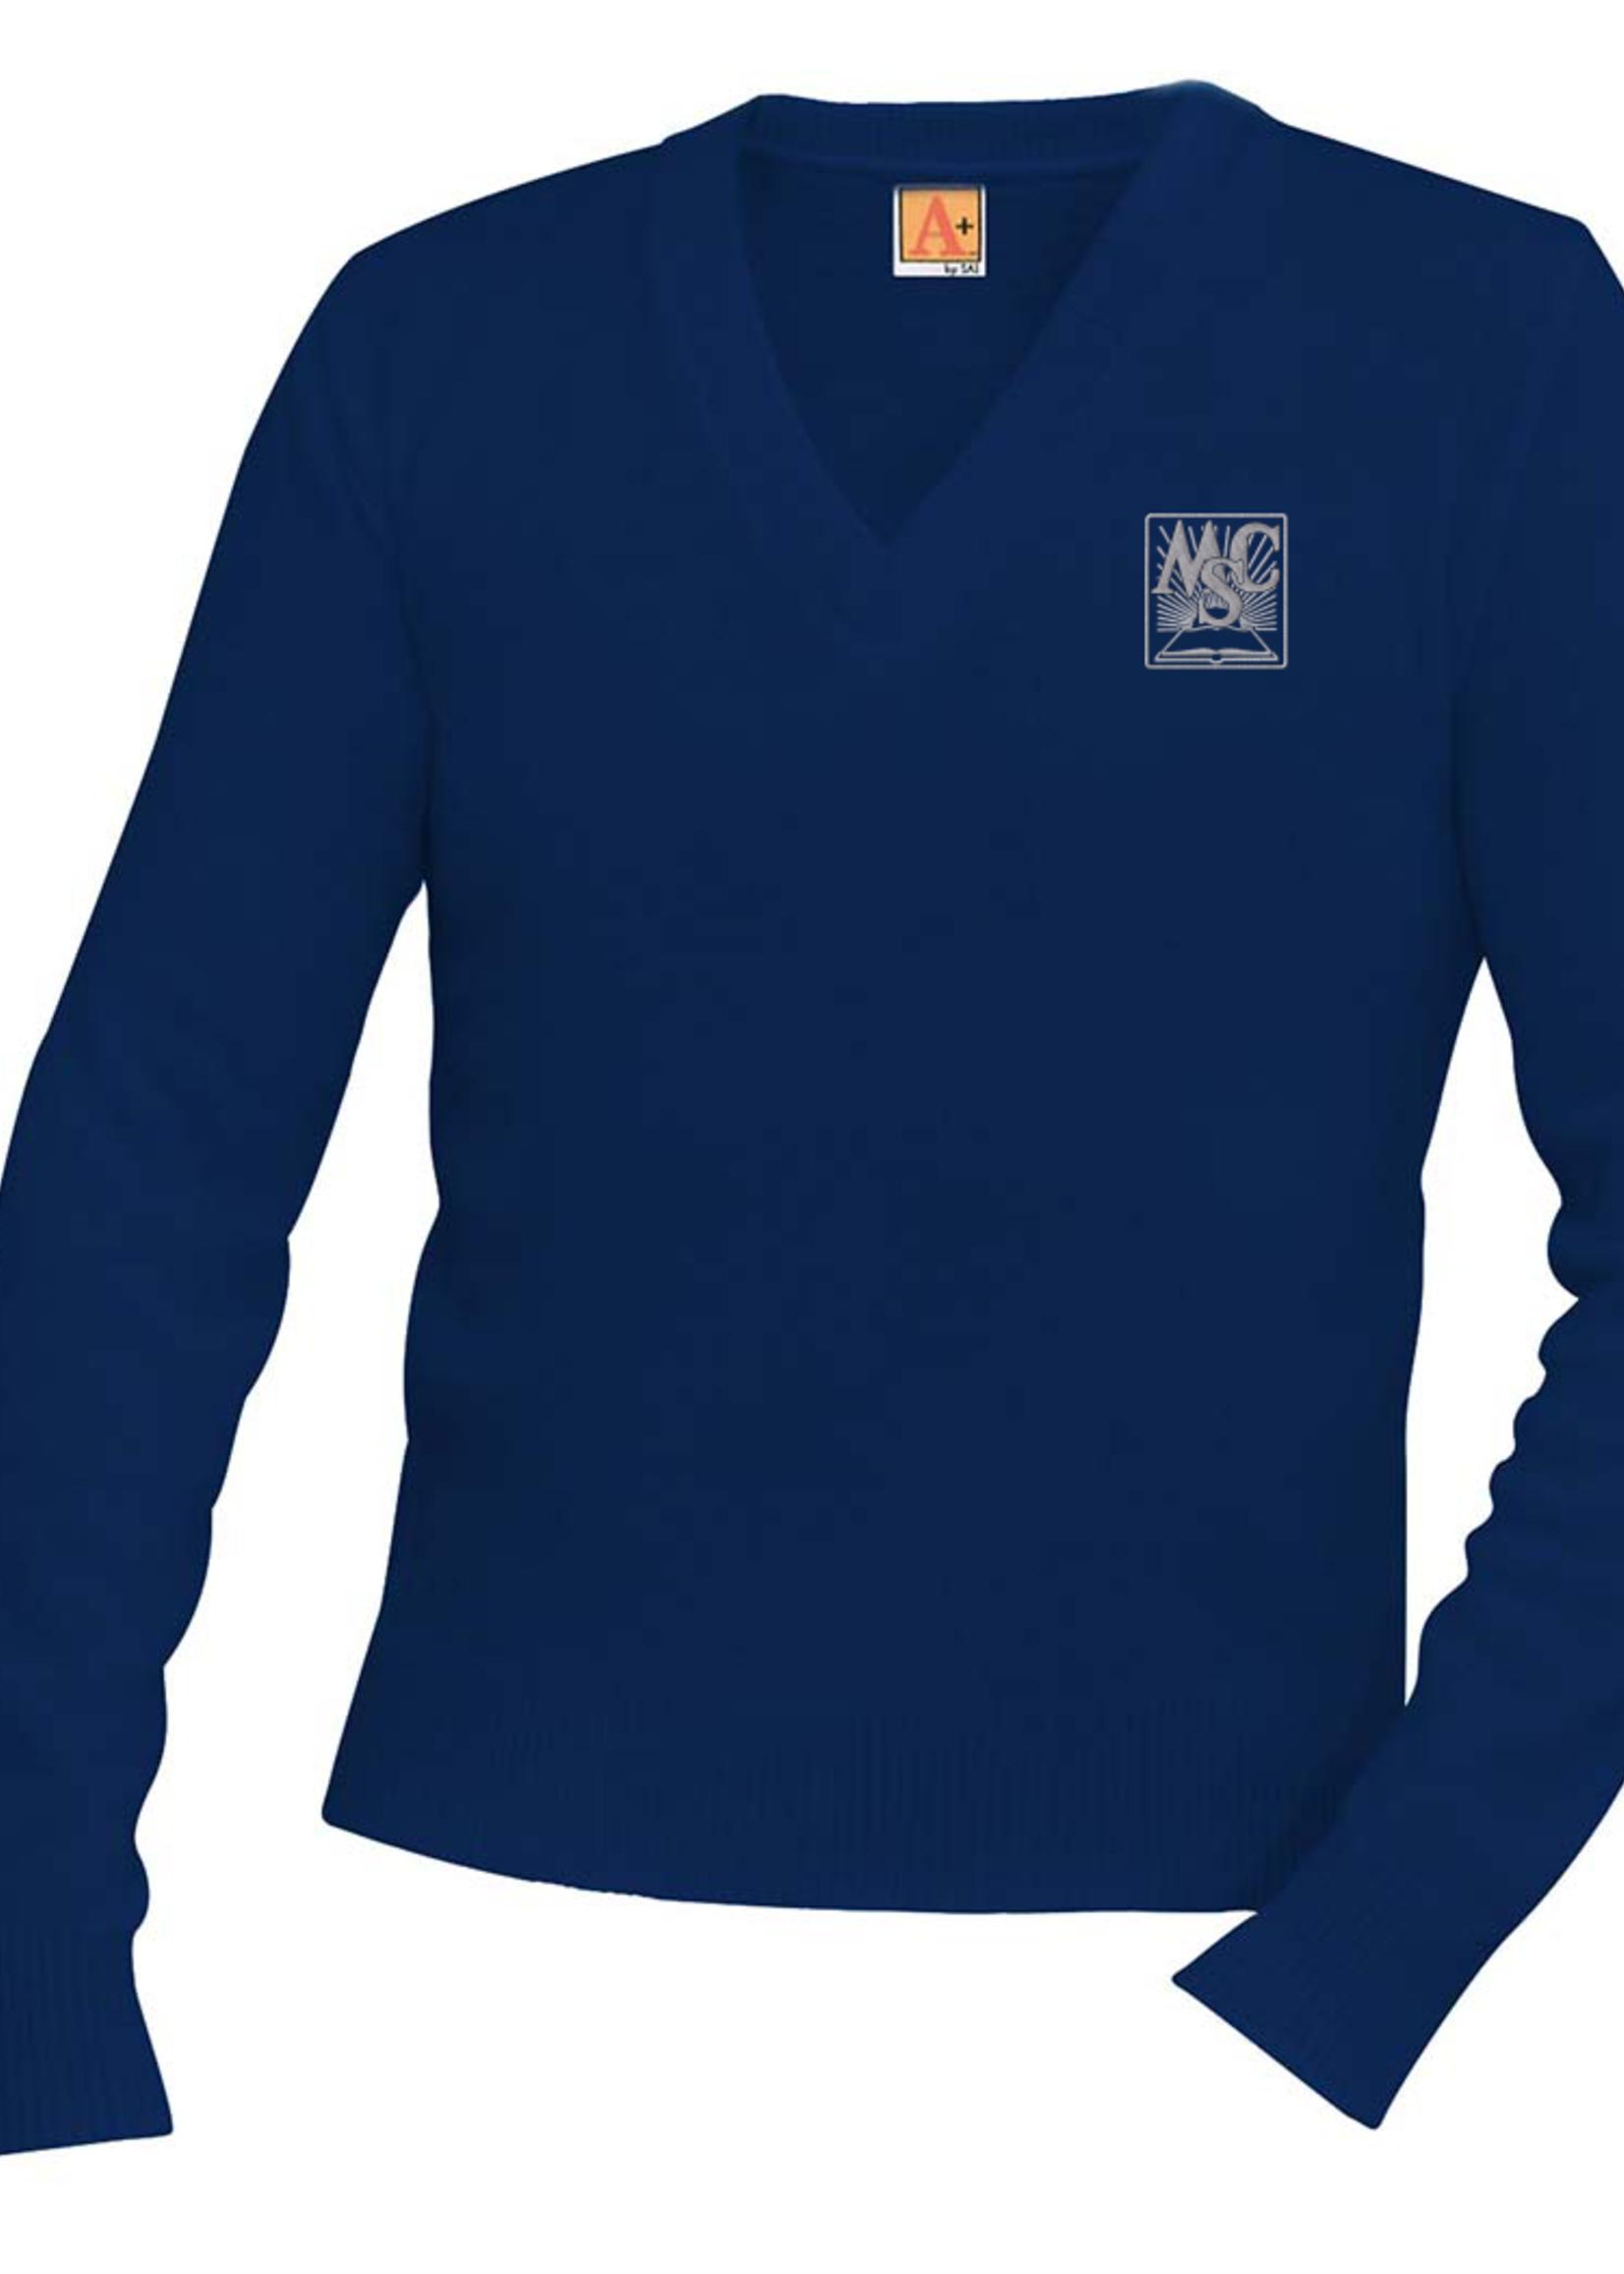 OLMC Navy V-neck Pullover sweater